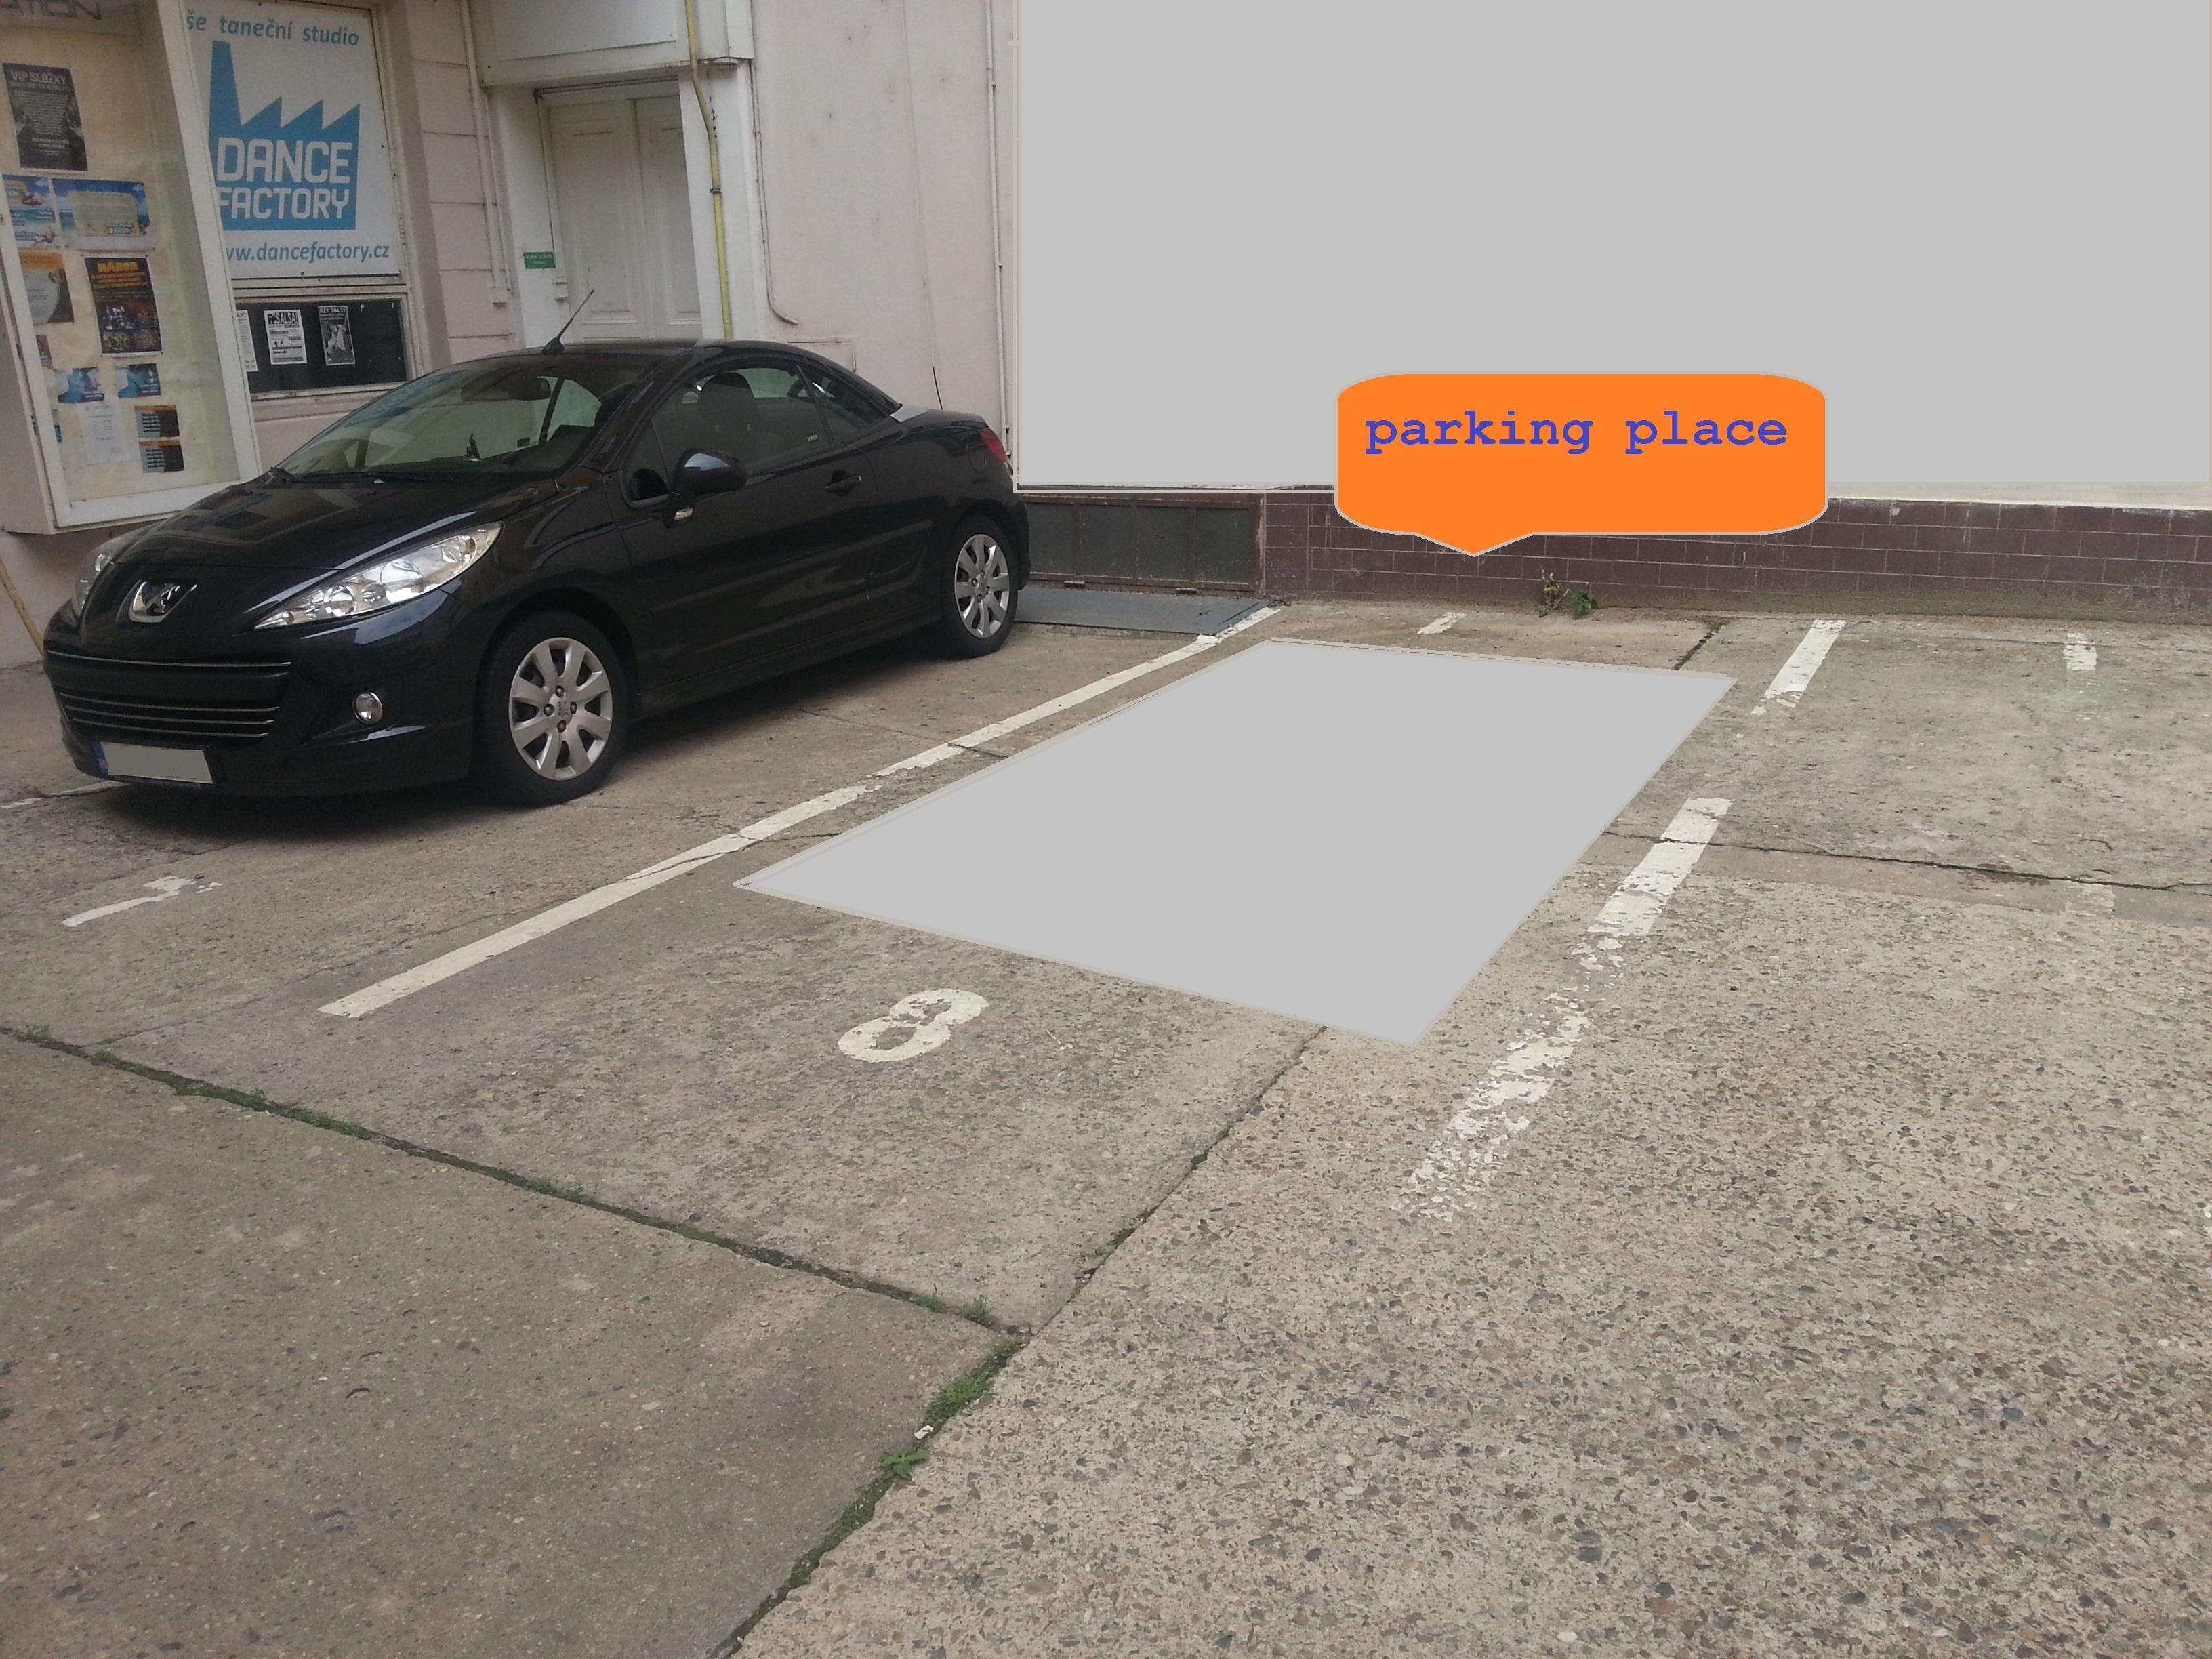 Jindrisska 7 Parking place